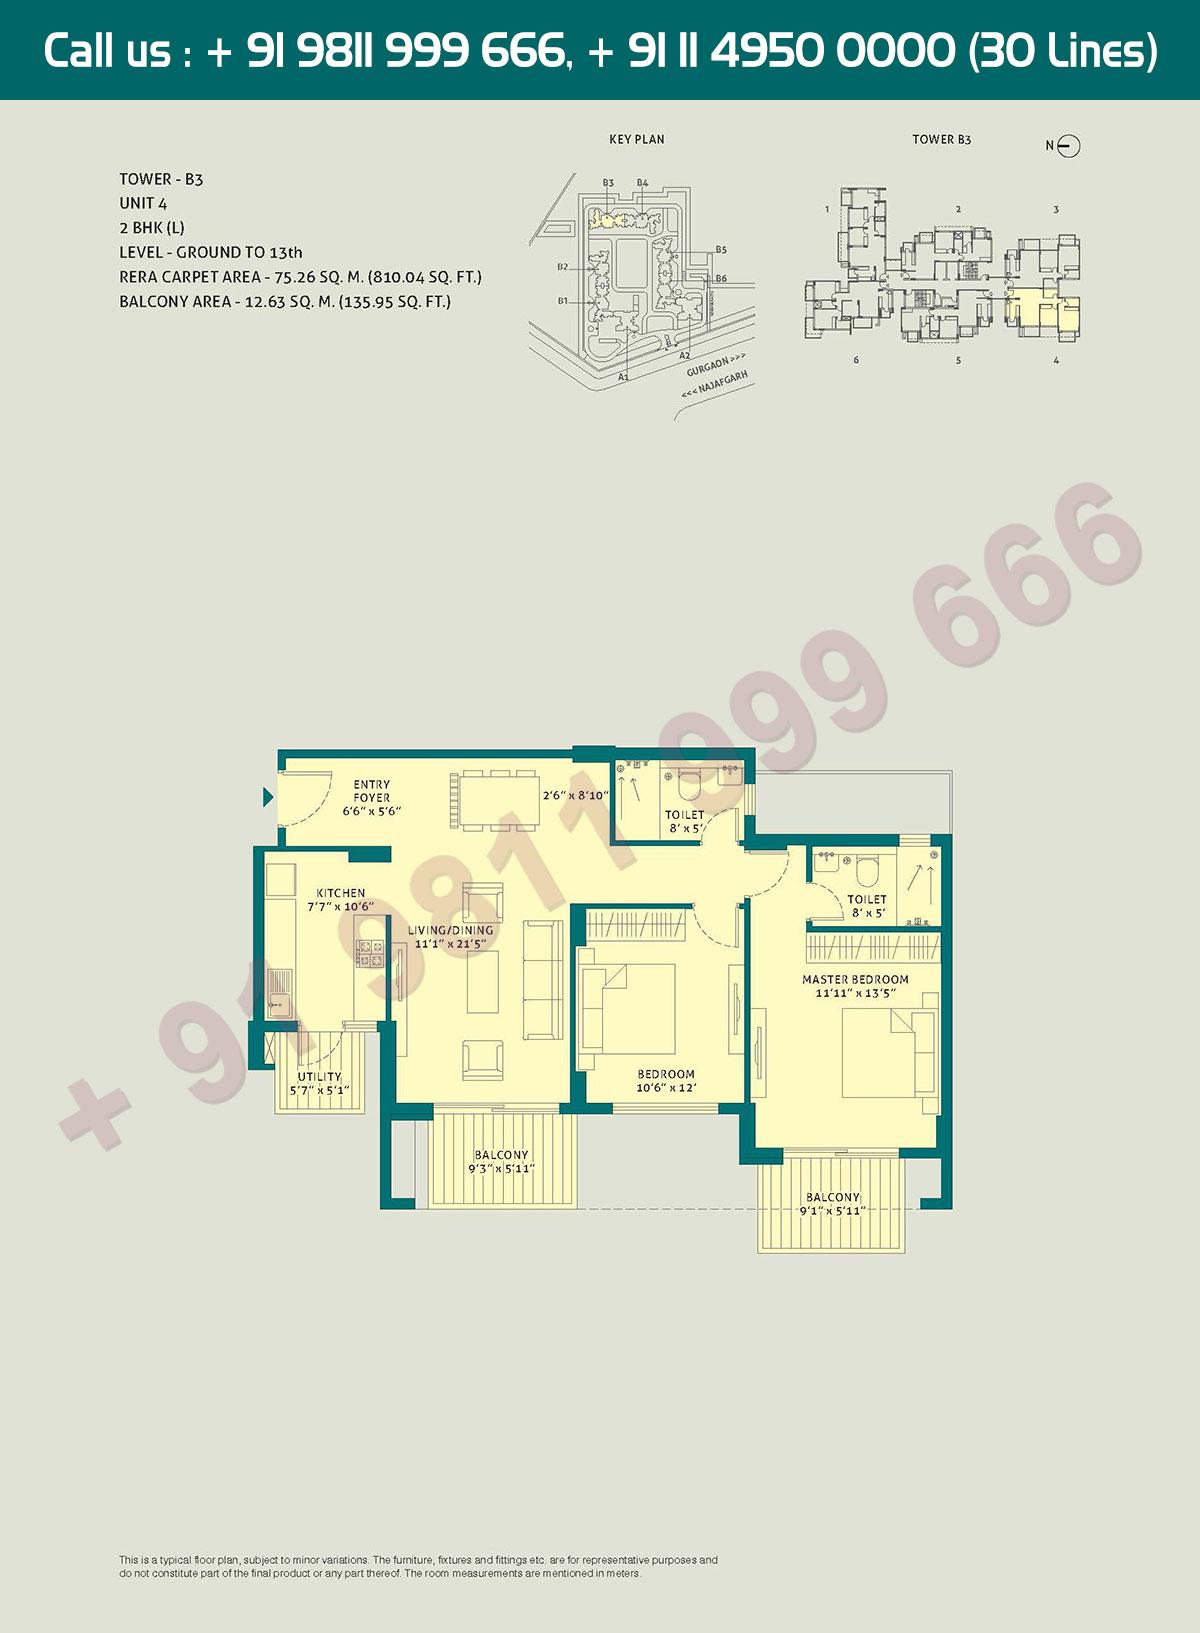 2 BHK - (L), Level Ground to 13, Unit - 4